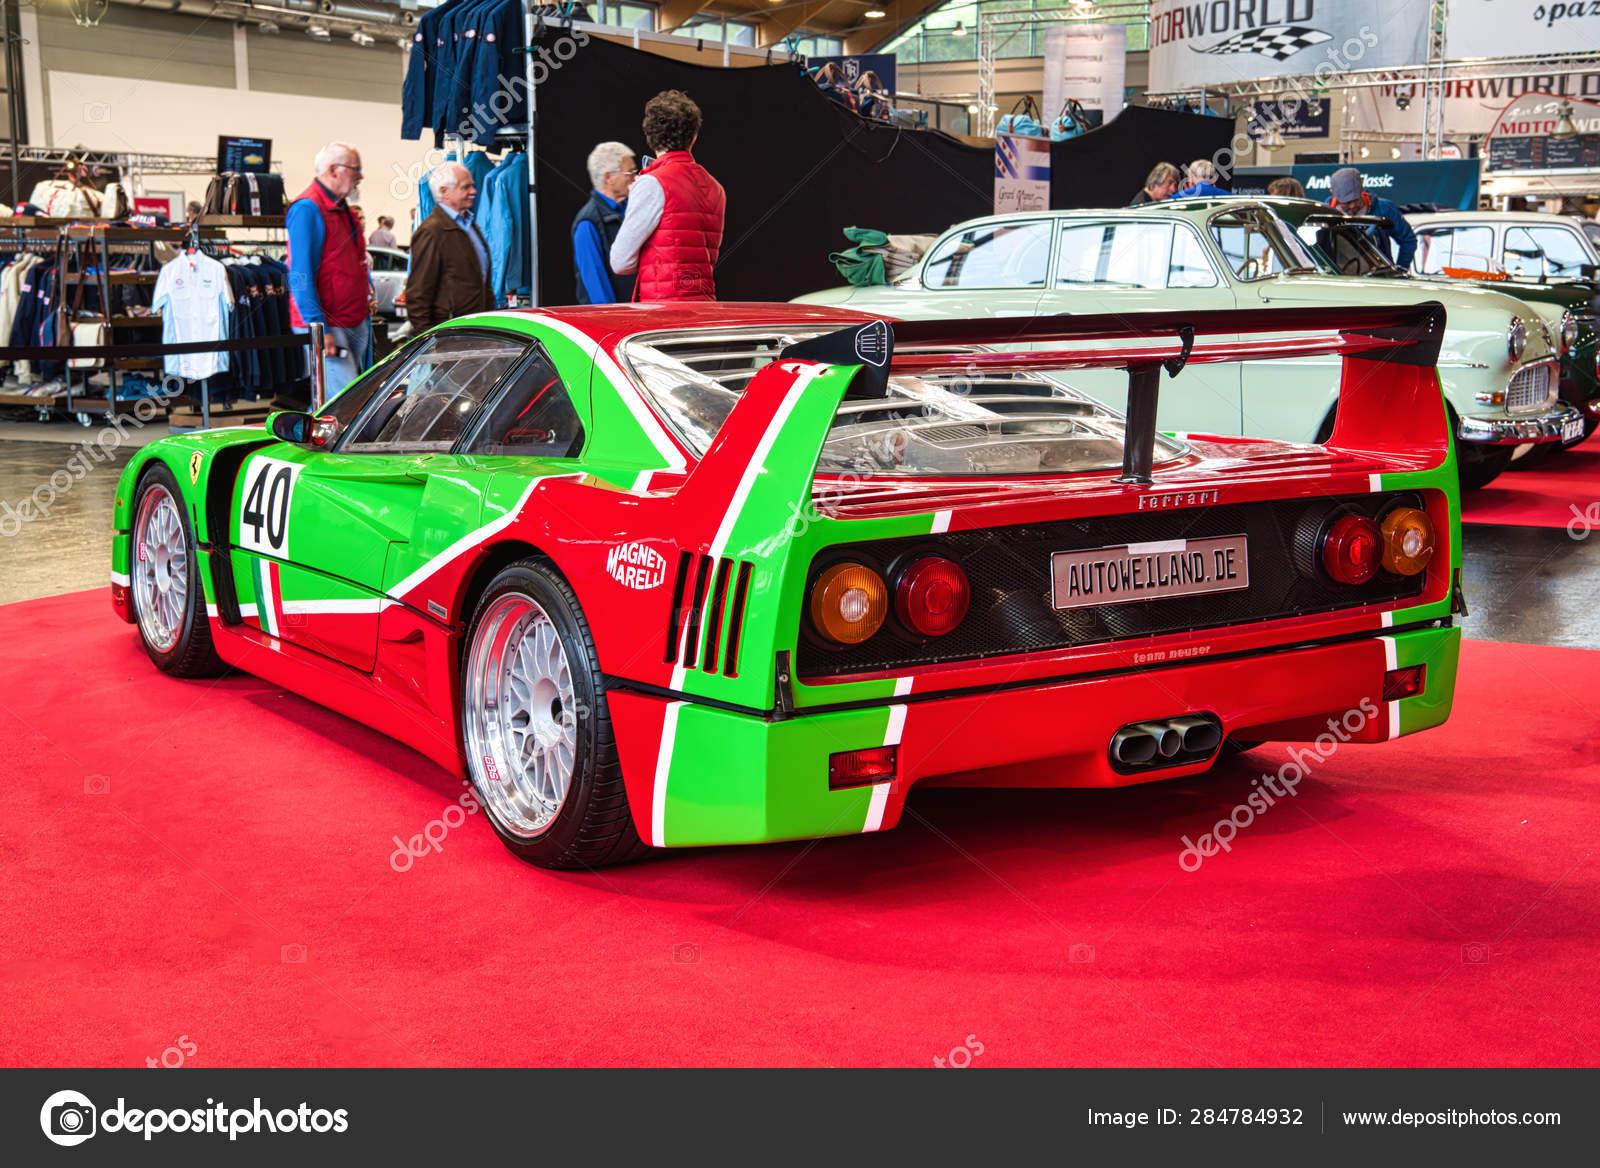 Friedrichshafen May 2019 Red Green Ferrari F40 1989 At Motorworld Classics Bodensee On May 11 2019 In Friedrichshafen Germany Stock Editorial Photo C Eagle2308 284784932